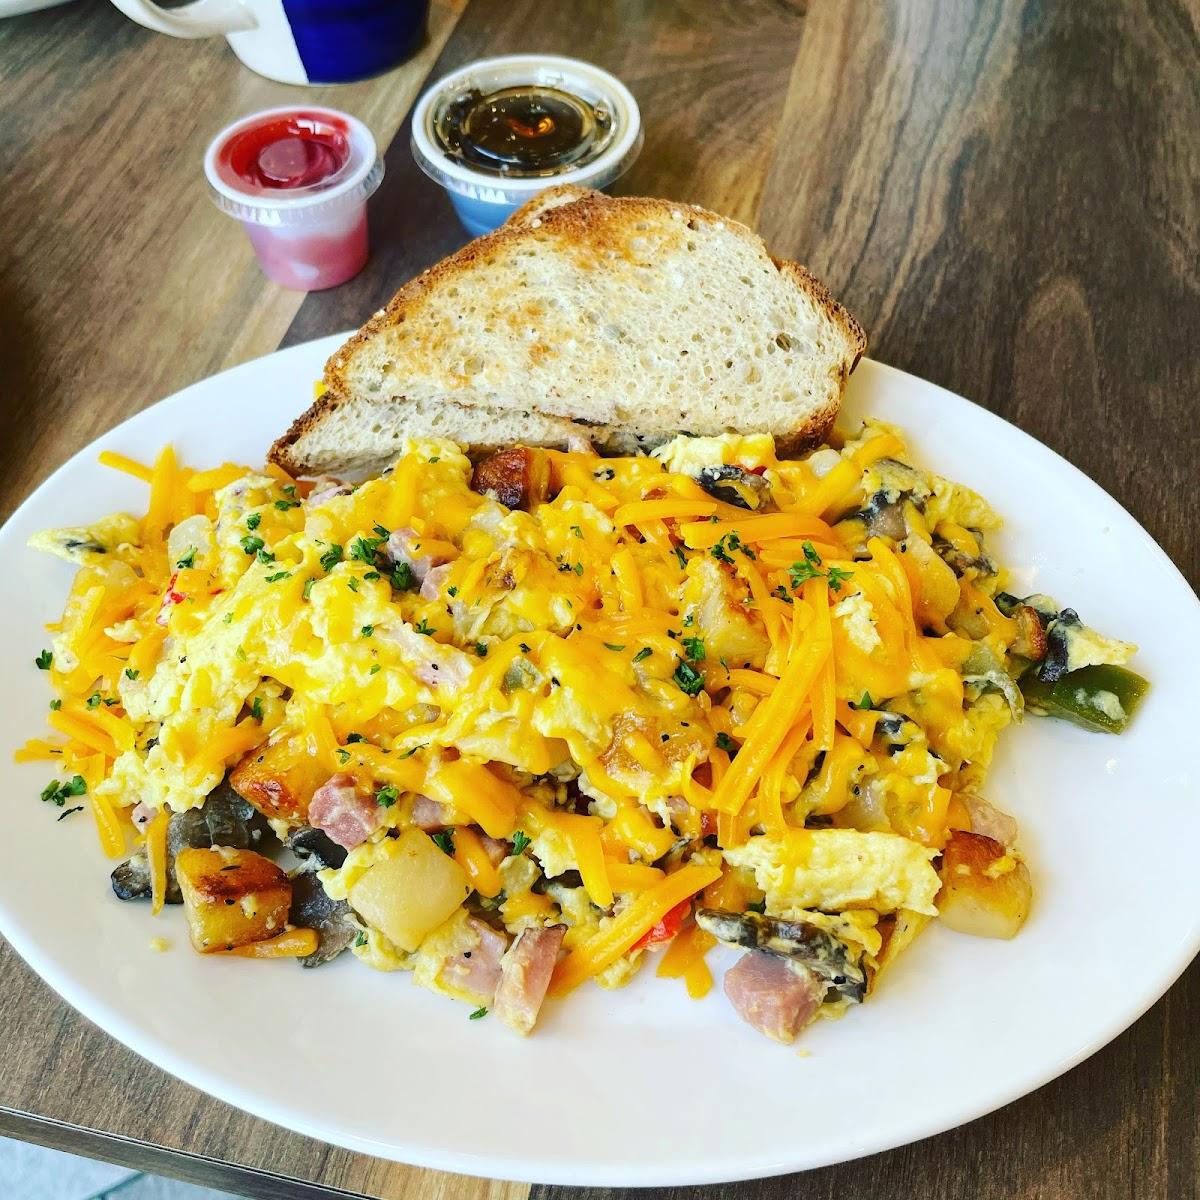 The 30 Best Gluten Free Restaurants In Green Bay Wisconsin 2021